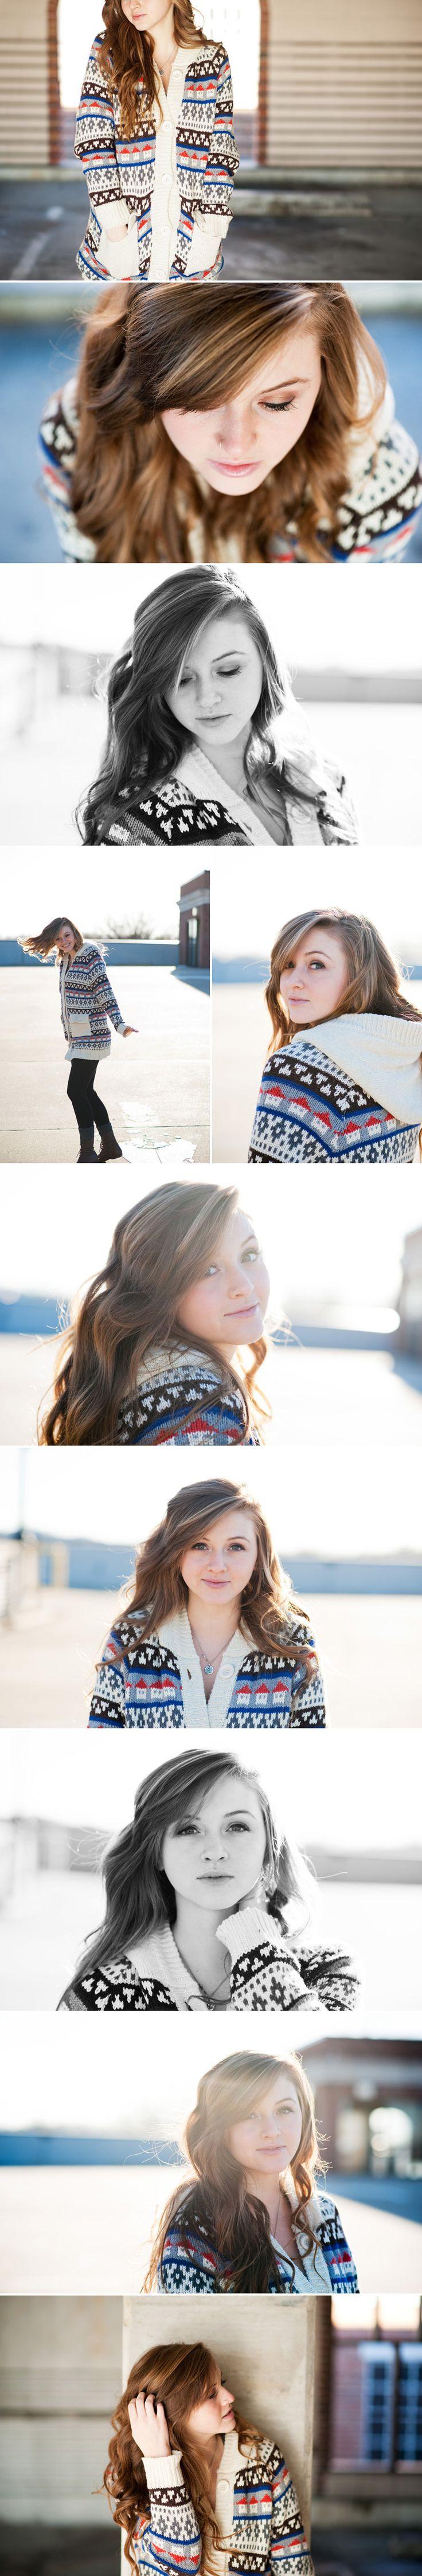 Molly / portraits - Alyssa Joy Photography